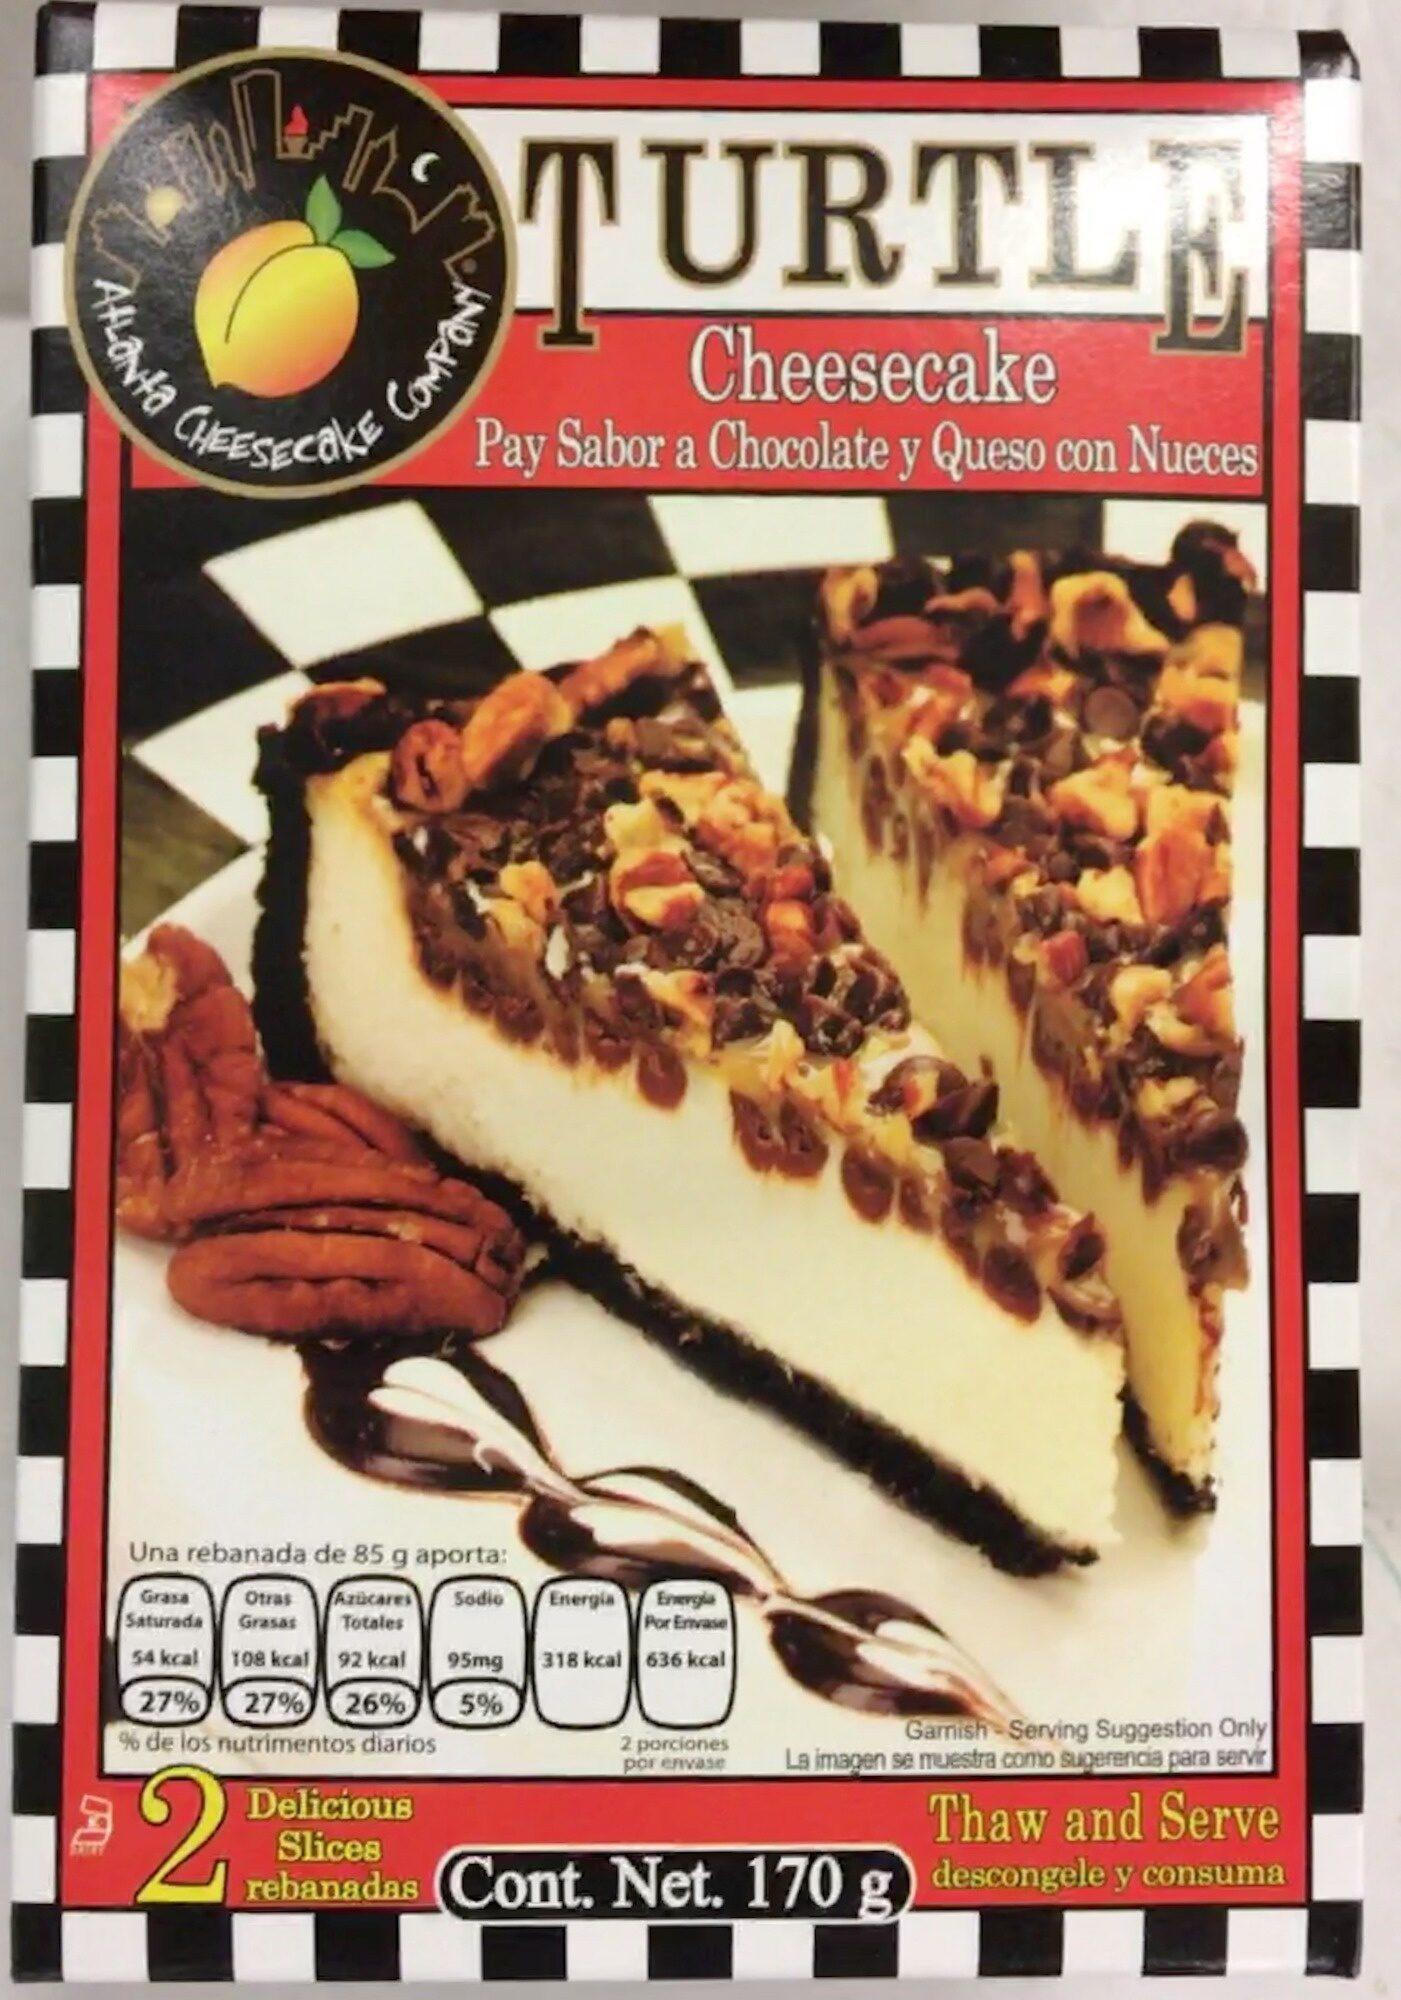 Turtle cheesecake - Product - en